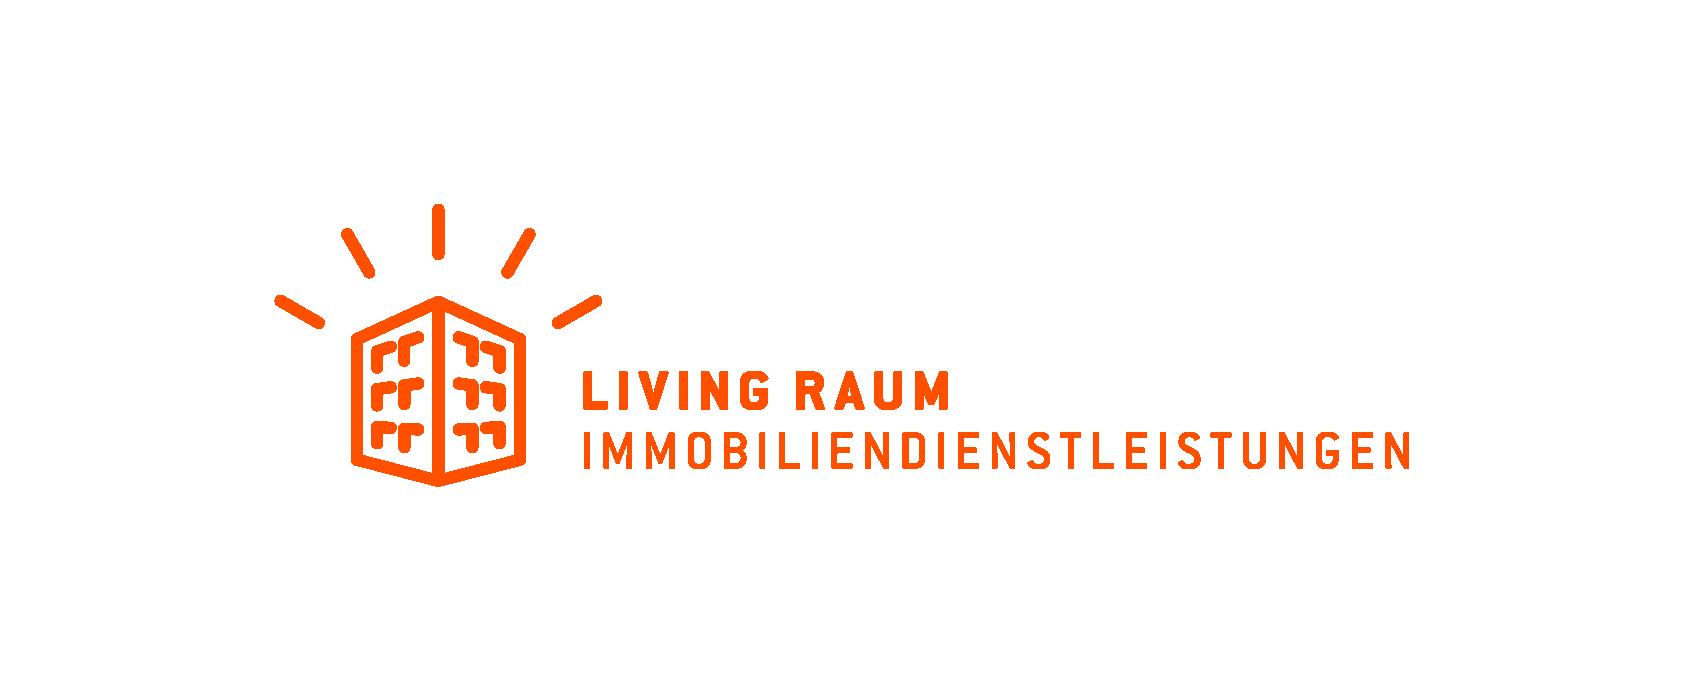 LIVING RAUM